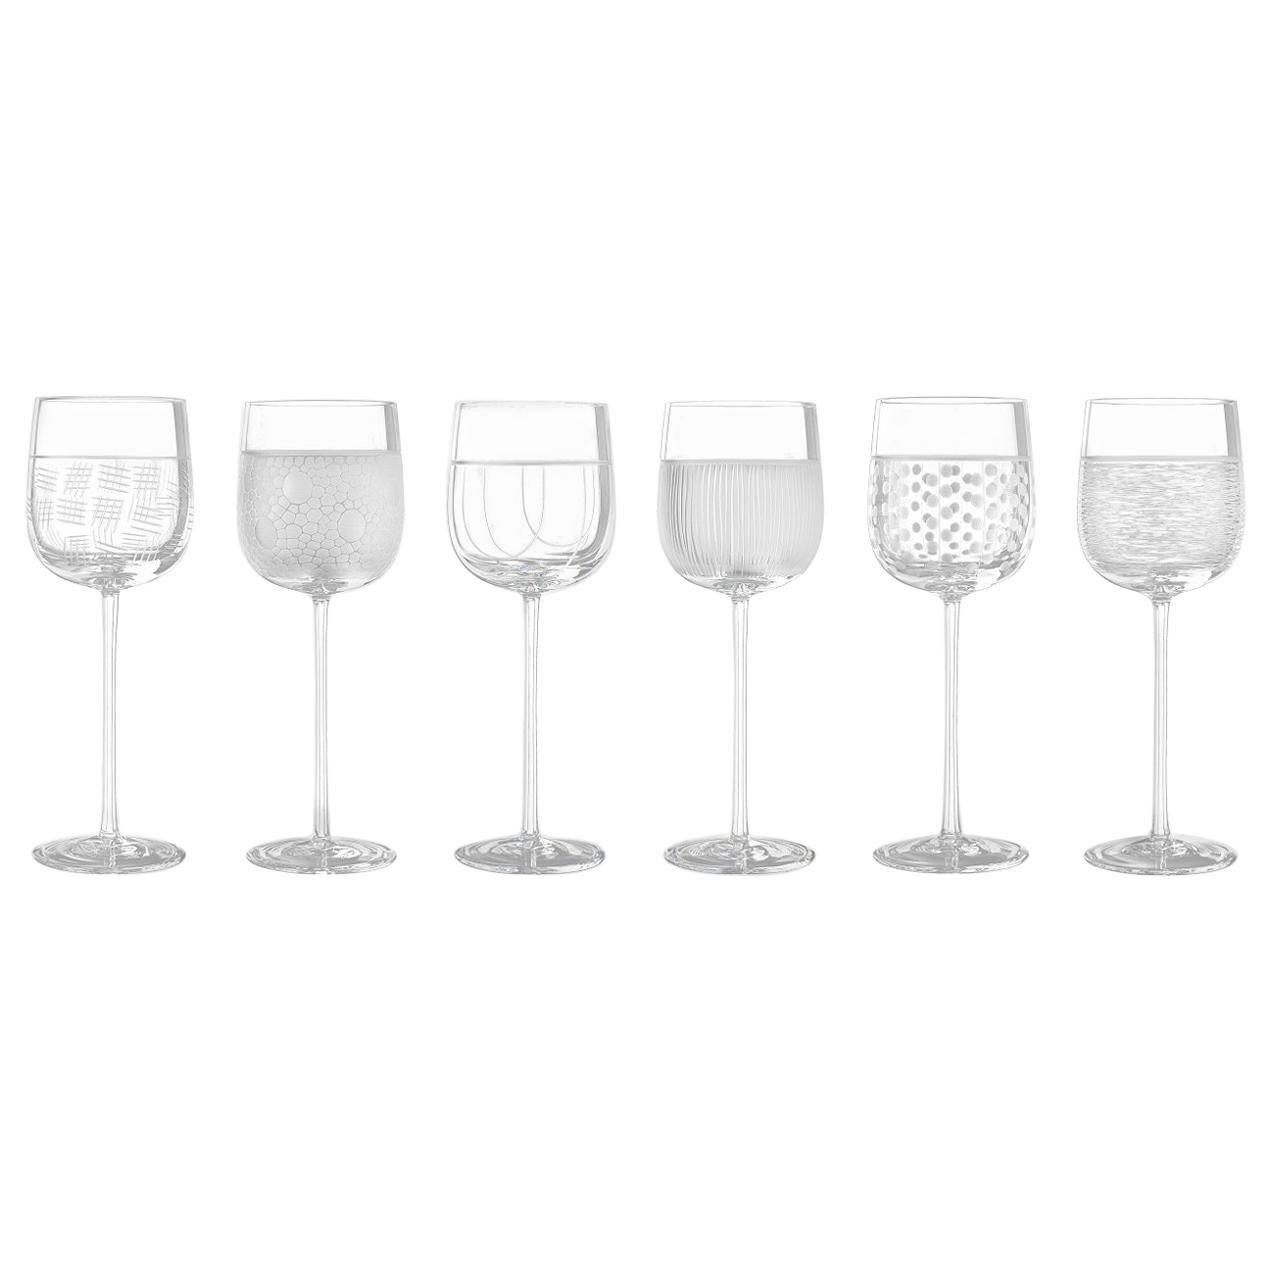 Salviati Nove Set of 6 Water Assorted Glasses